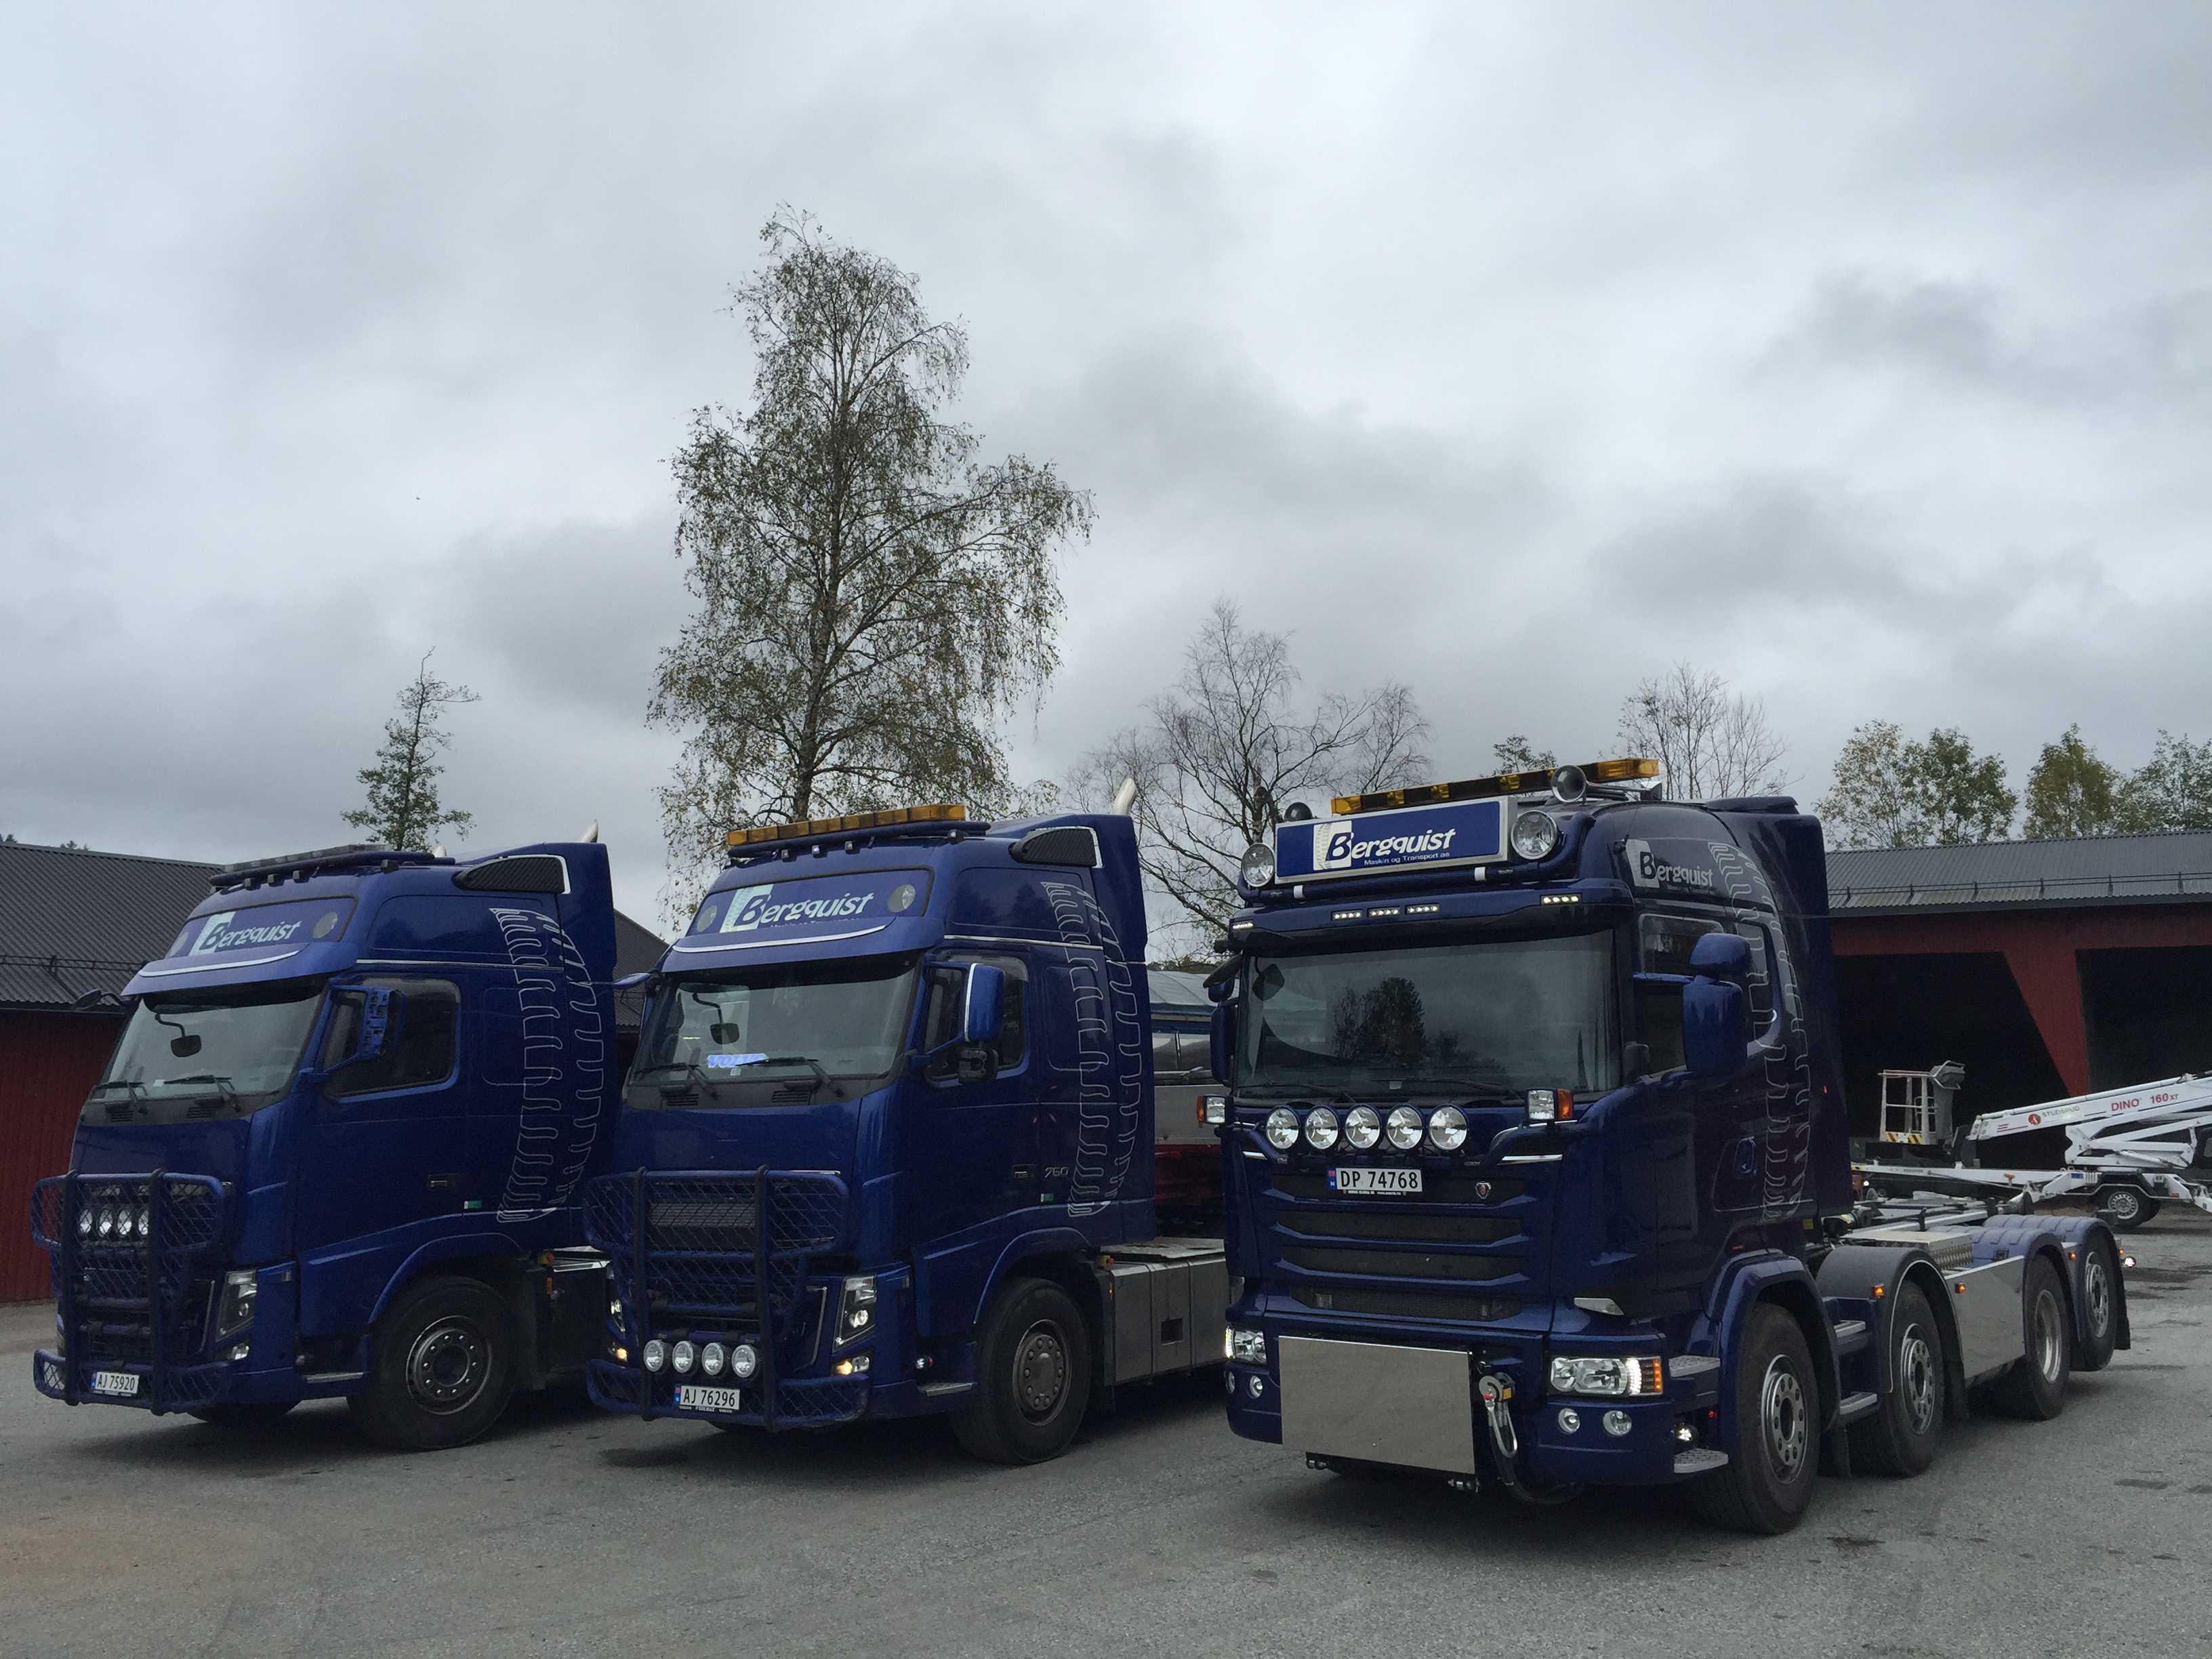 Bilde av lastebiloppstilling